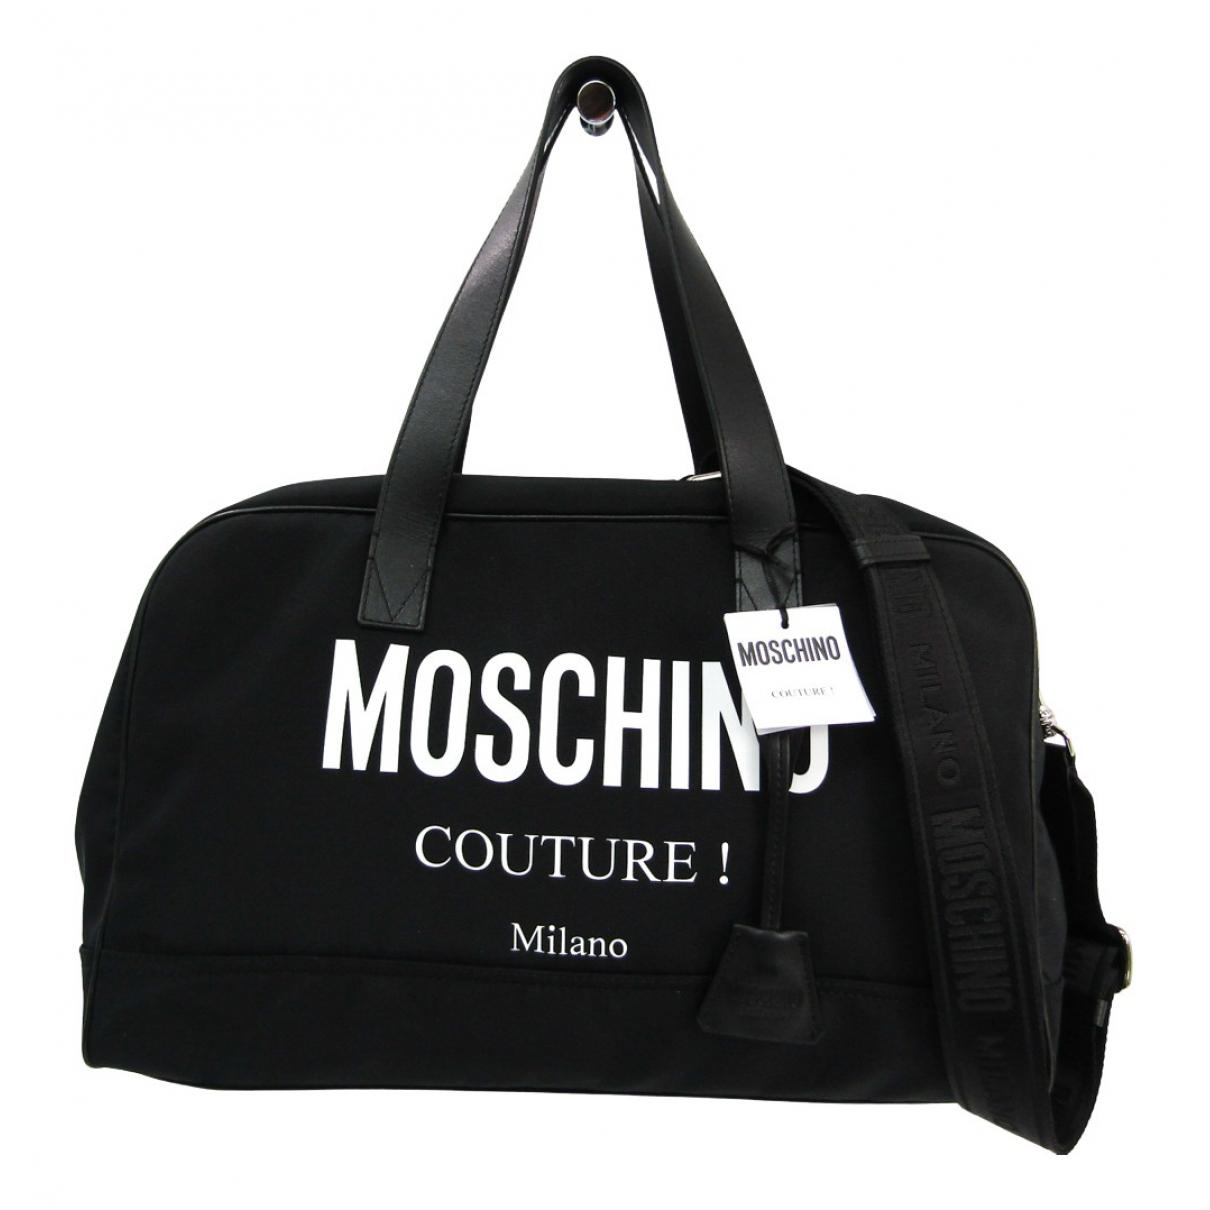 Moschino - Sac de voyage   pour femme en toile - noir